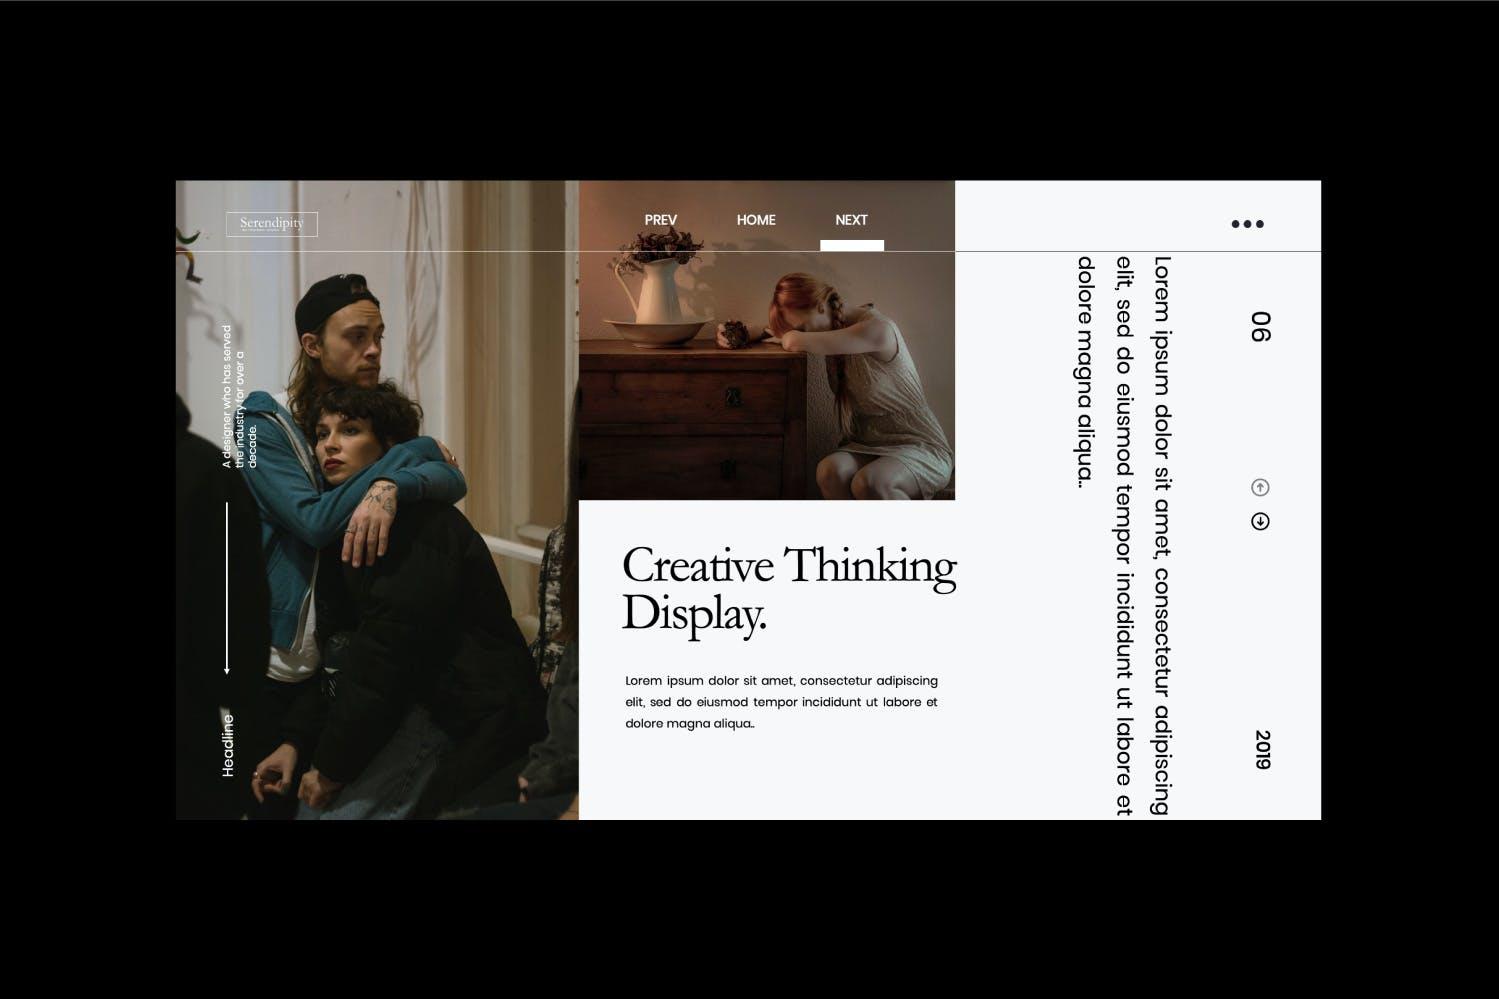 时尚简约服装摄影作品集幻灯片设计模板 Serendipity – Modern Fashion Design Powerpoint插图(6)